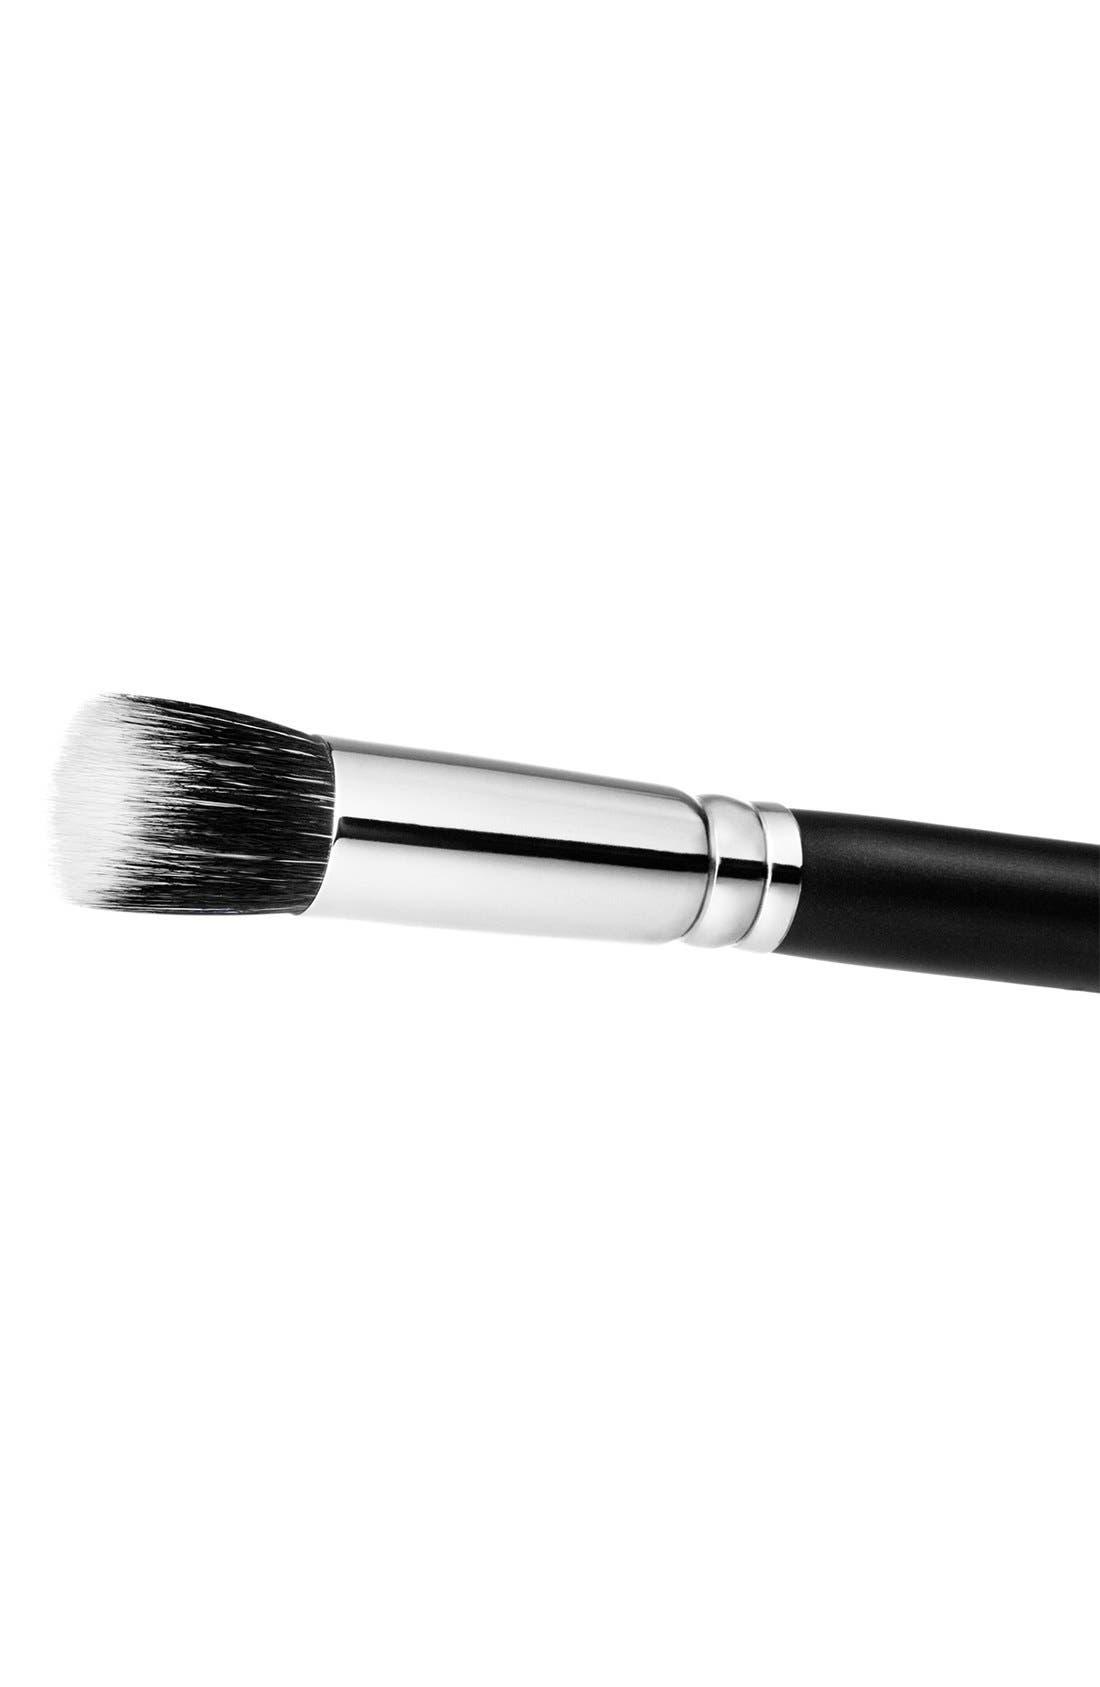 MAC 130 Short Duo Fibre Brush,                             Alternate thumbnail 3, color,                             000